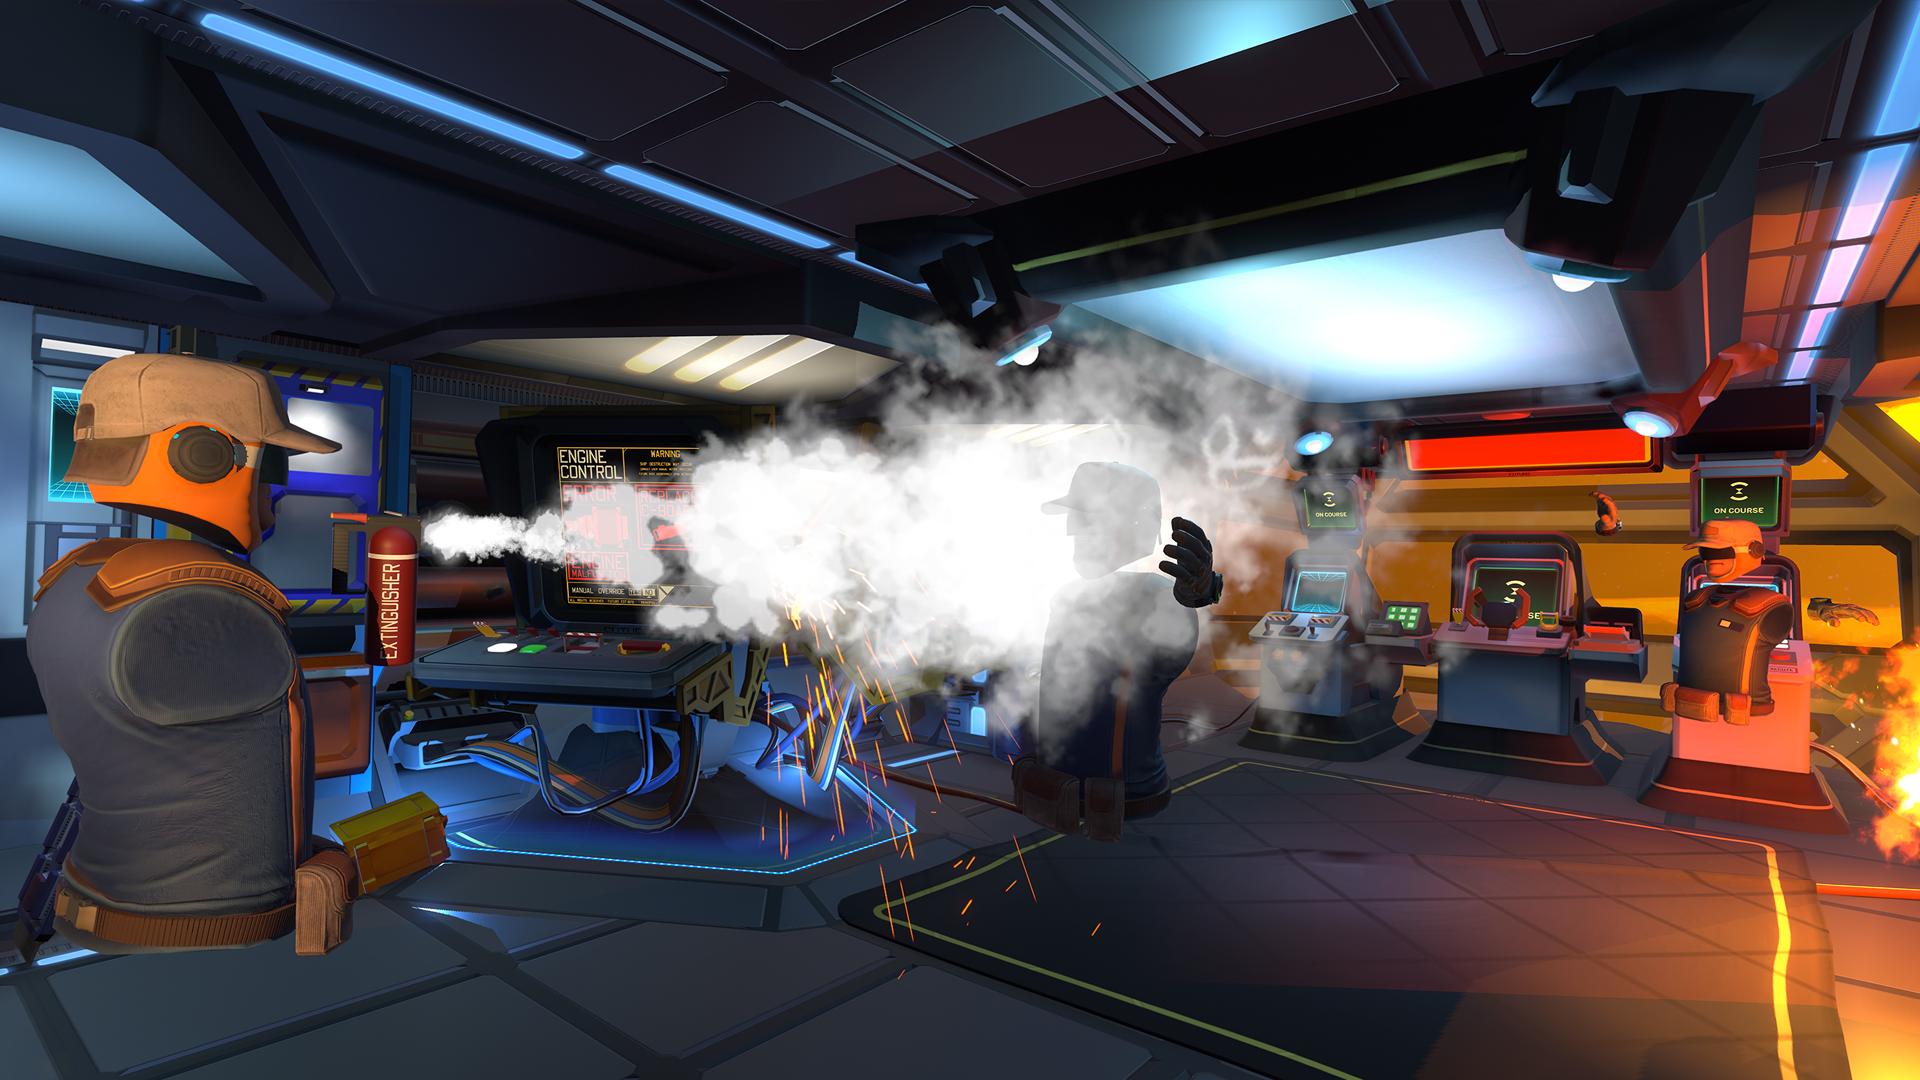 Failspace-HipFire-Games-VR-Multiplayer